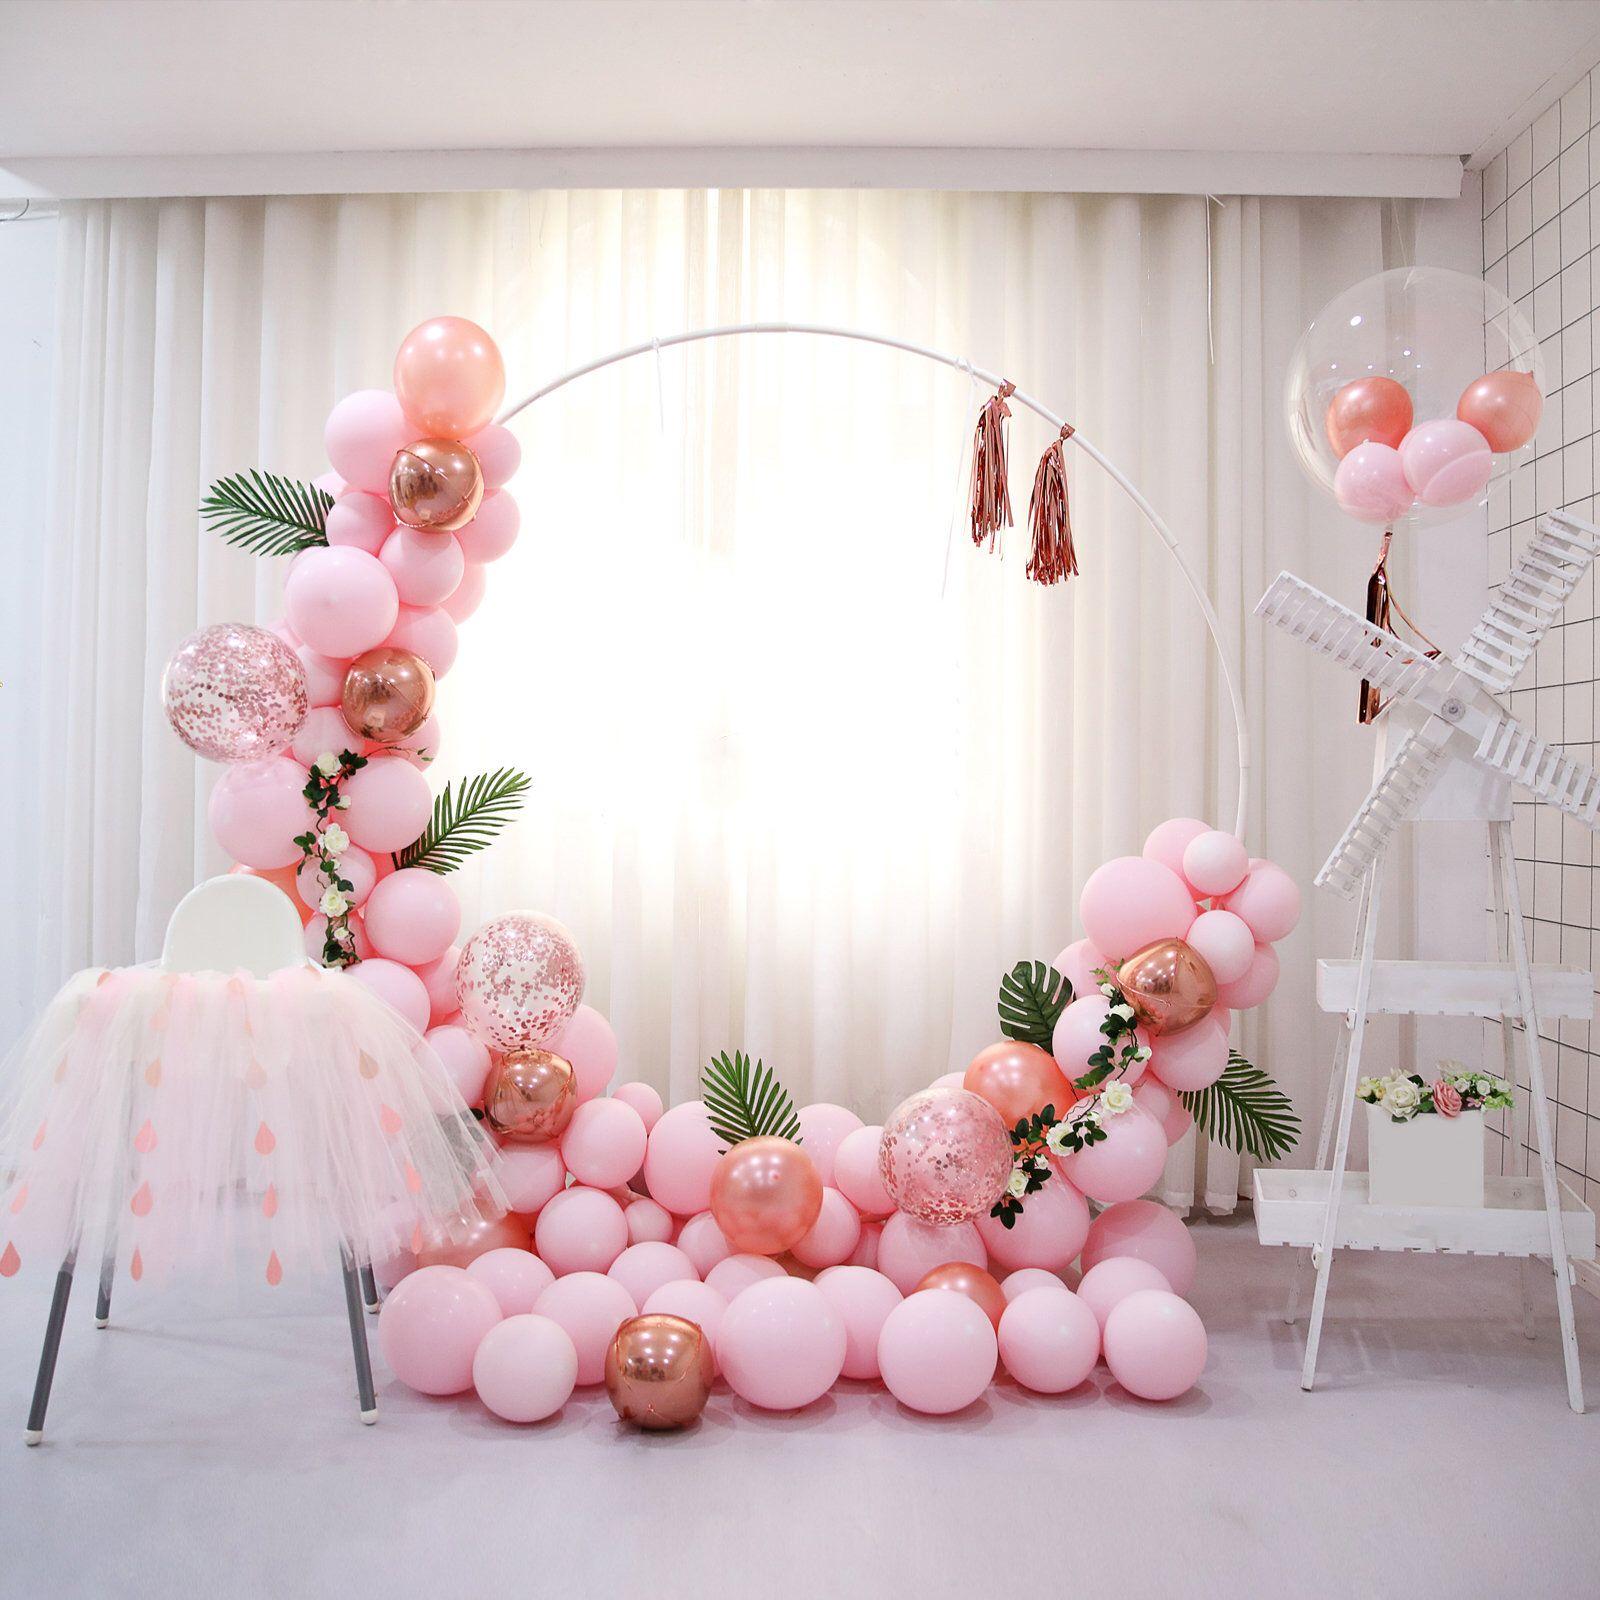 5ft Diameter Metal Circle with Stand Balloon Garland Hoop Kit Pastel Pink Latex Rose Gold Balloons Leaves Tassel Wedding Birthday Decoration